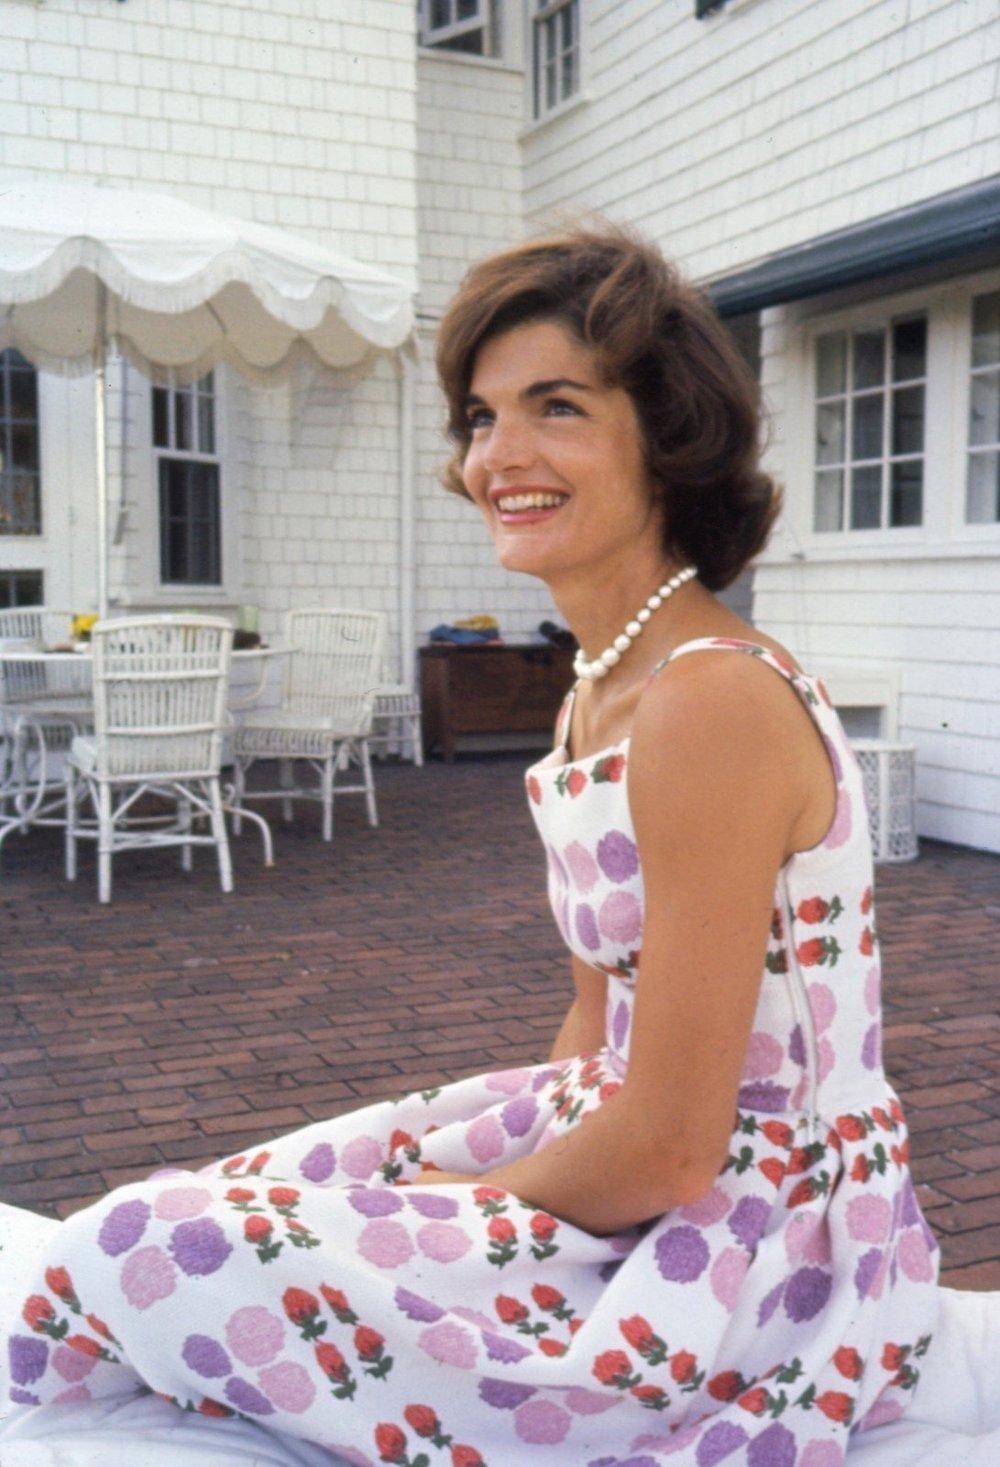 Jacqueline Kennedy by Phillip Harrington, 1959 via The Harrington Collection/Alamy